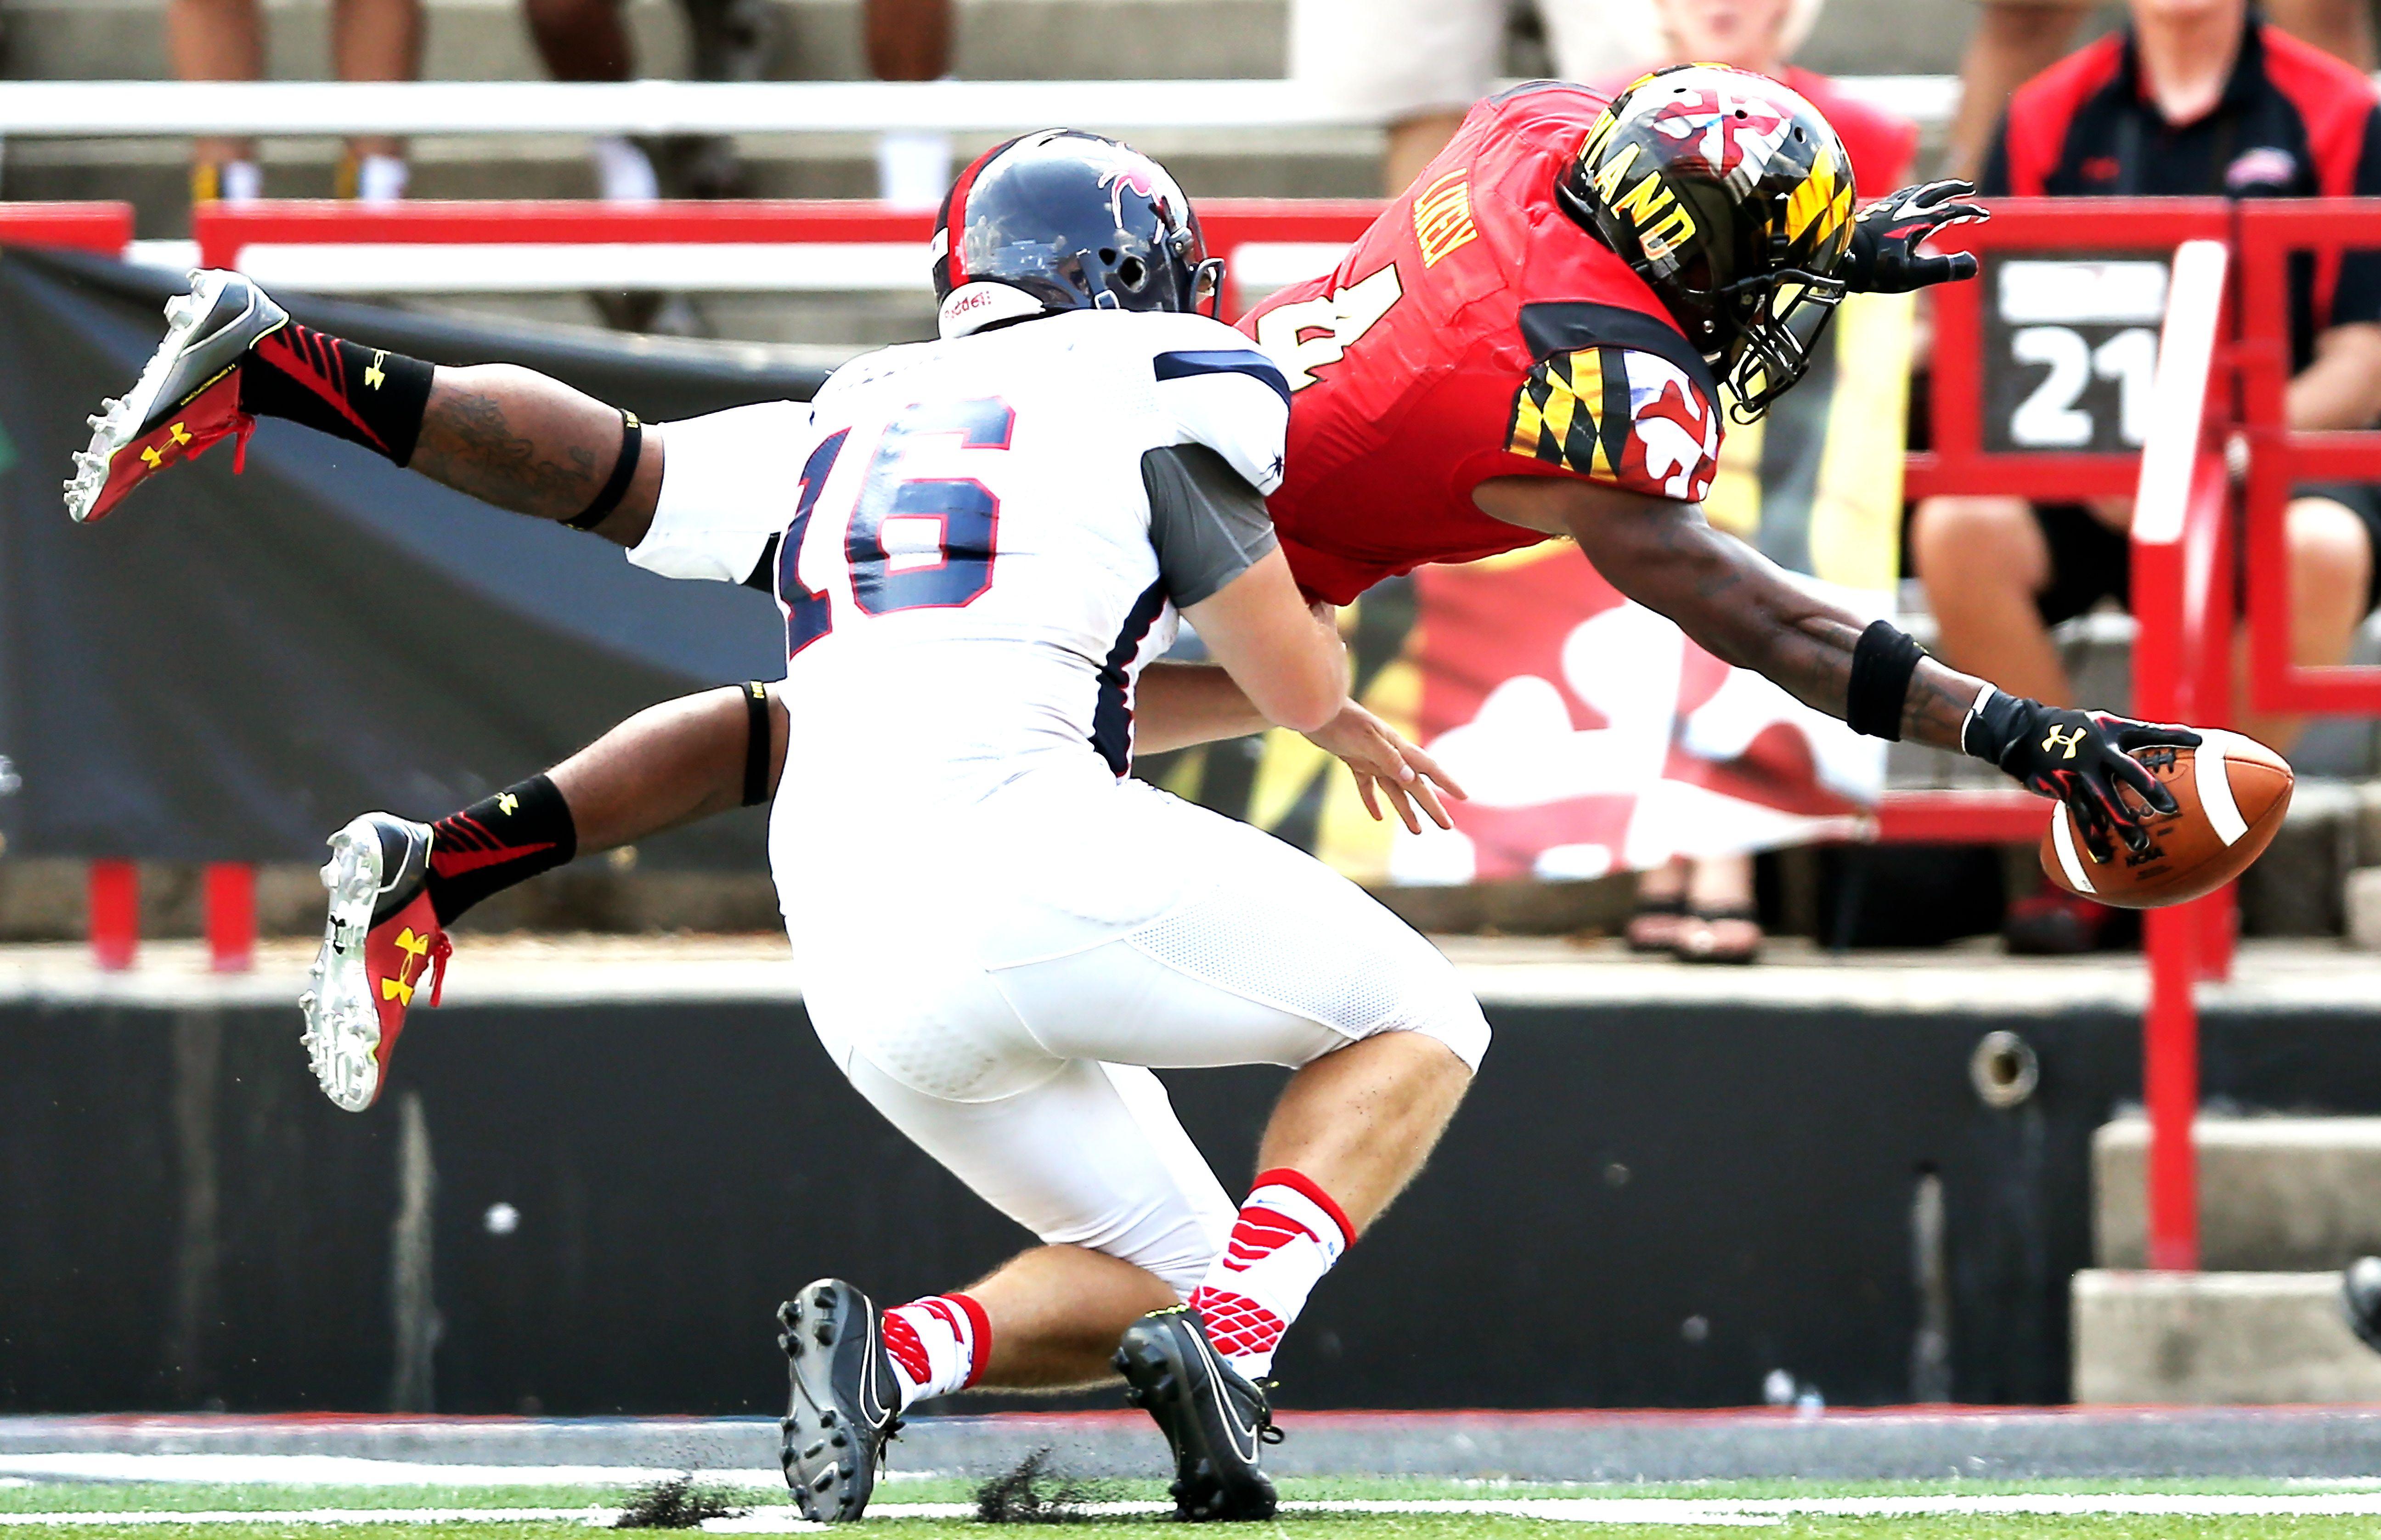 espn football scores college saturday college football games